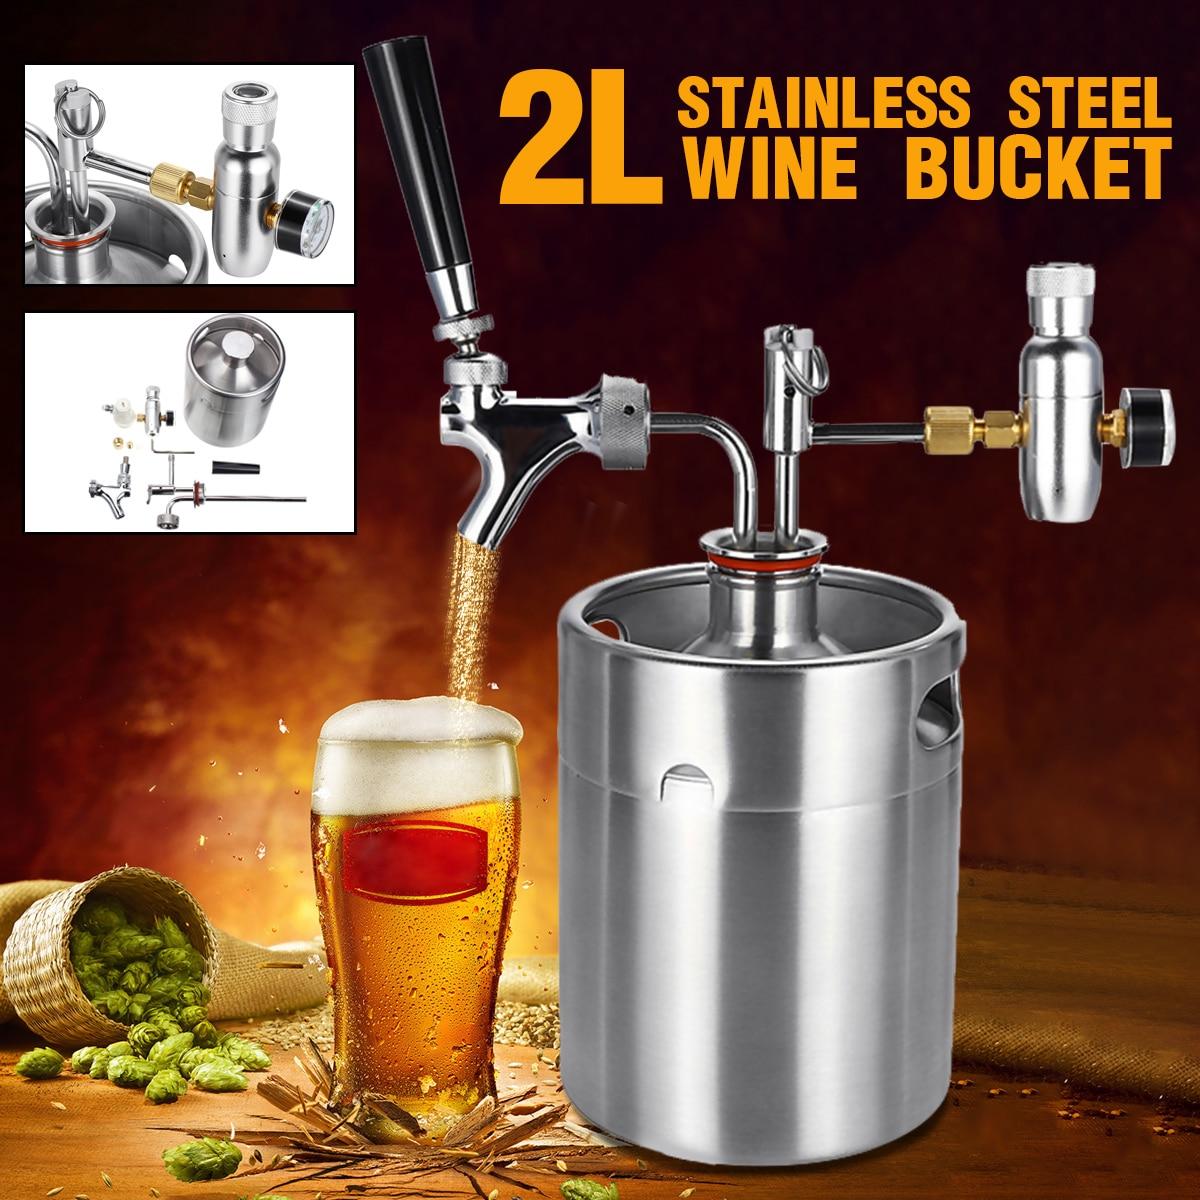 2L 耐久性のあるステンレス鋼ワインビール樽ホームビールディスペンサー Growler ビール醸造クラフトミニビール樽蛇口加圧